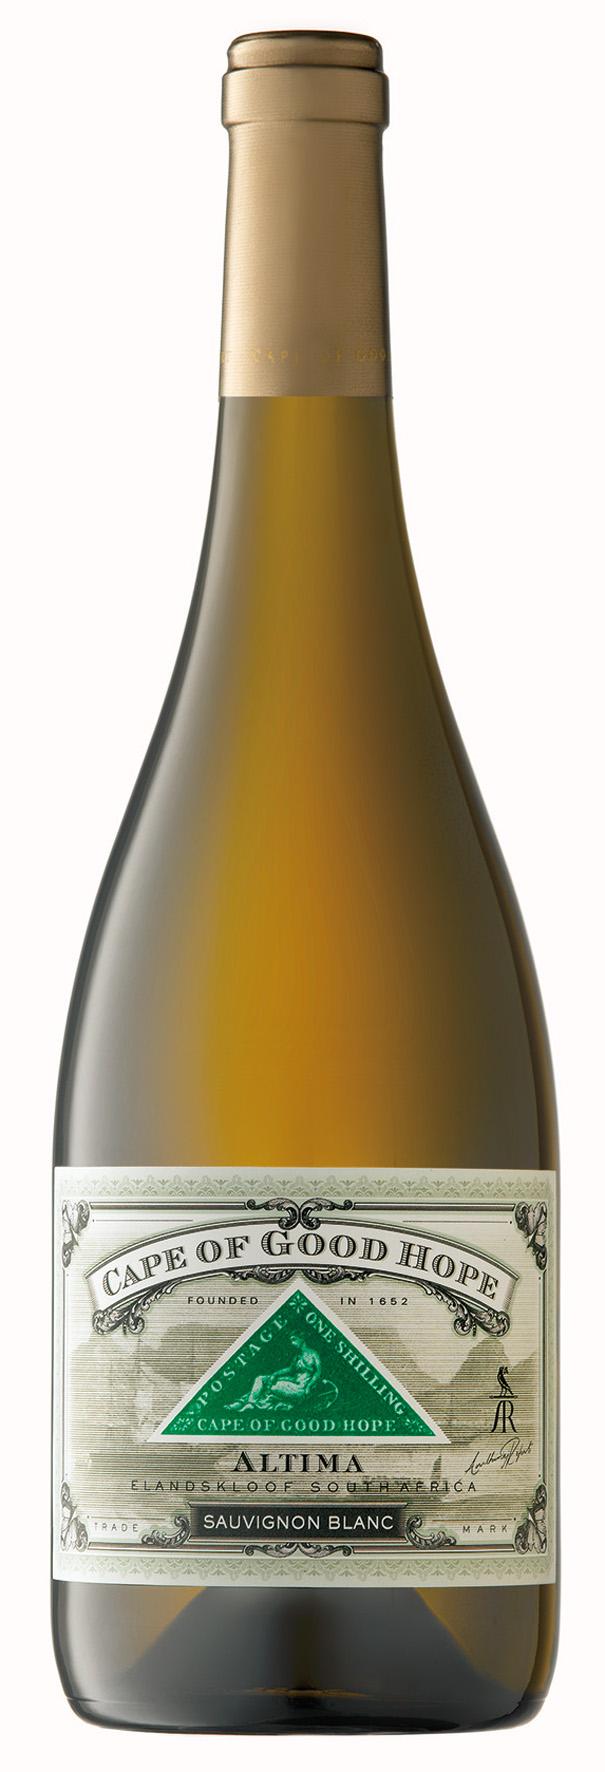 Cape of Good Hope Altima Sauvignon Blanc 2016 Anthonij Rupert Wyne